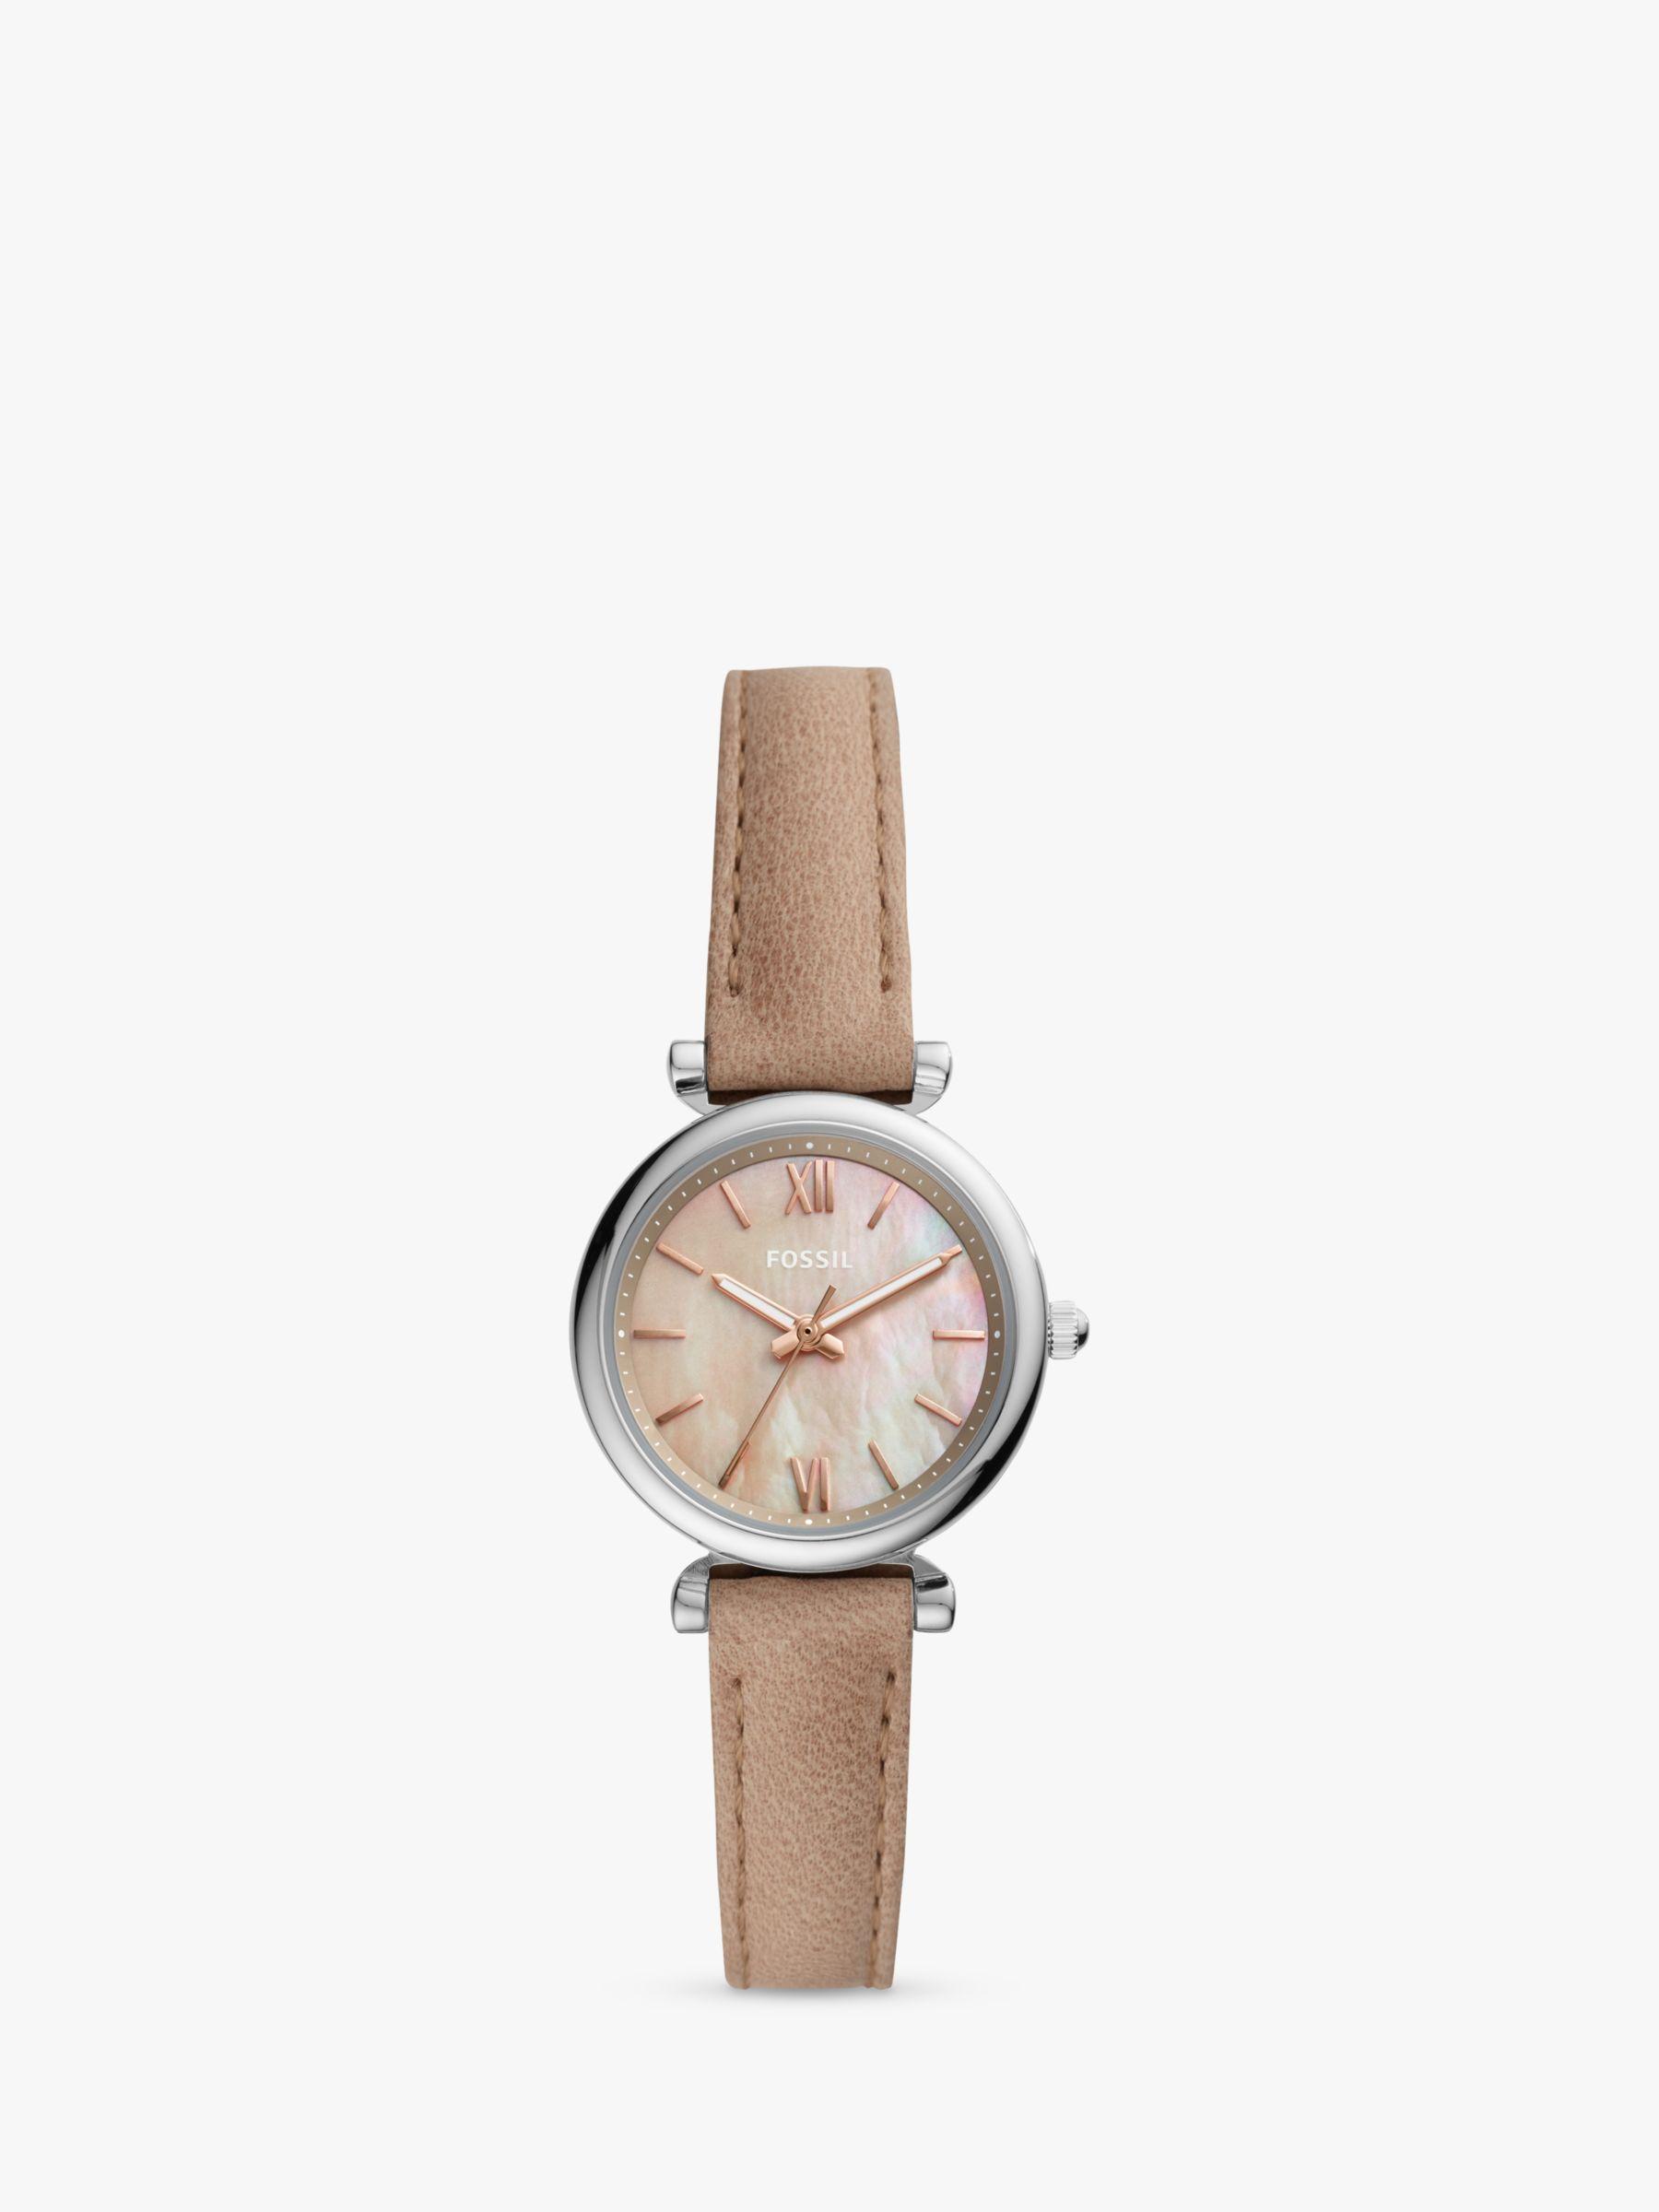 Fossil Fossil ES4530 Women's Carlie Leather Strap Watch, Beige/Pink